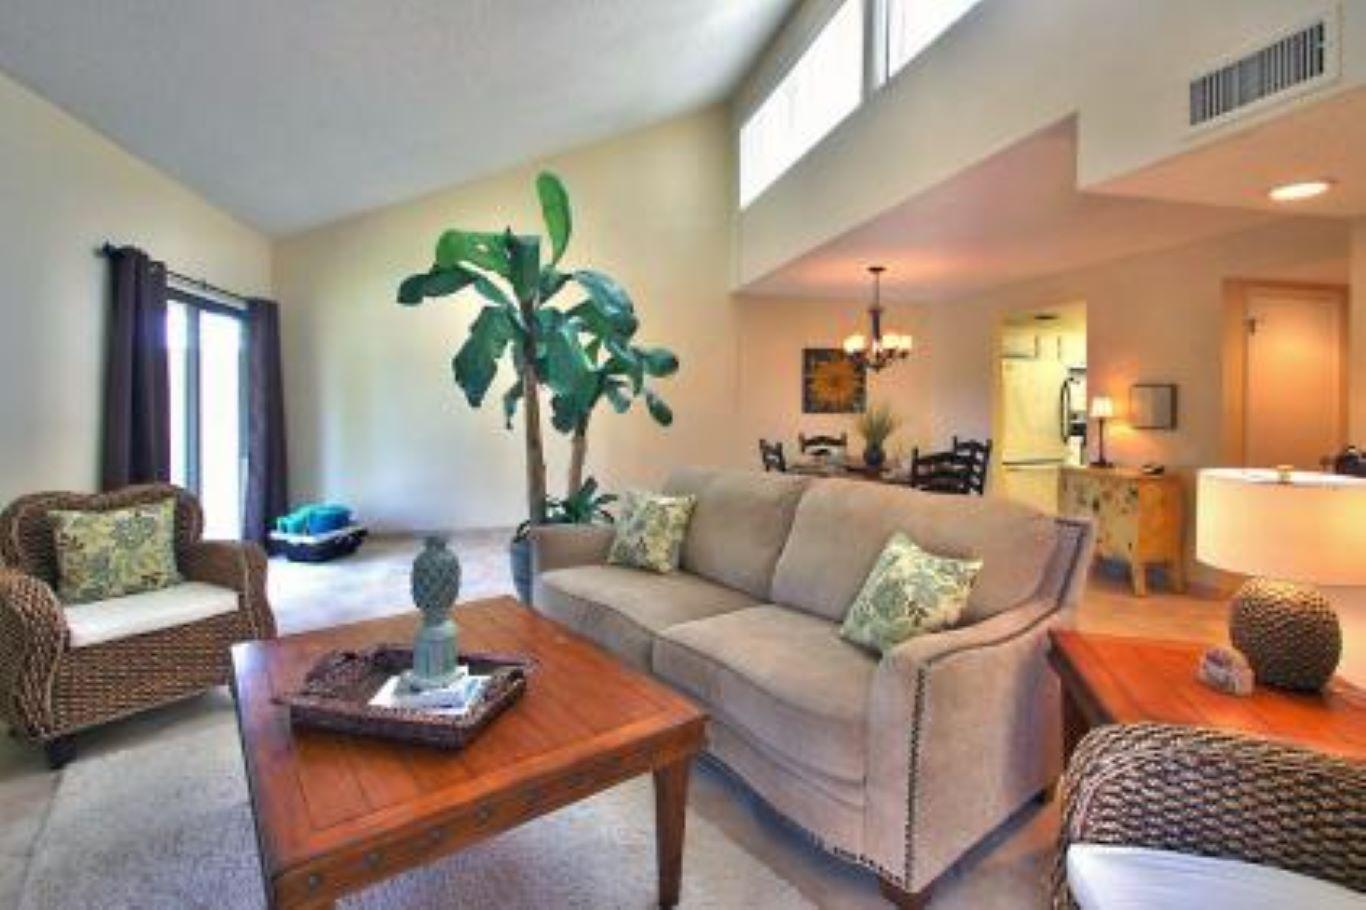 View Across Living Room